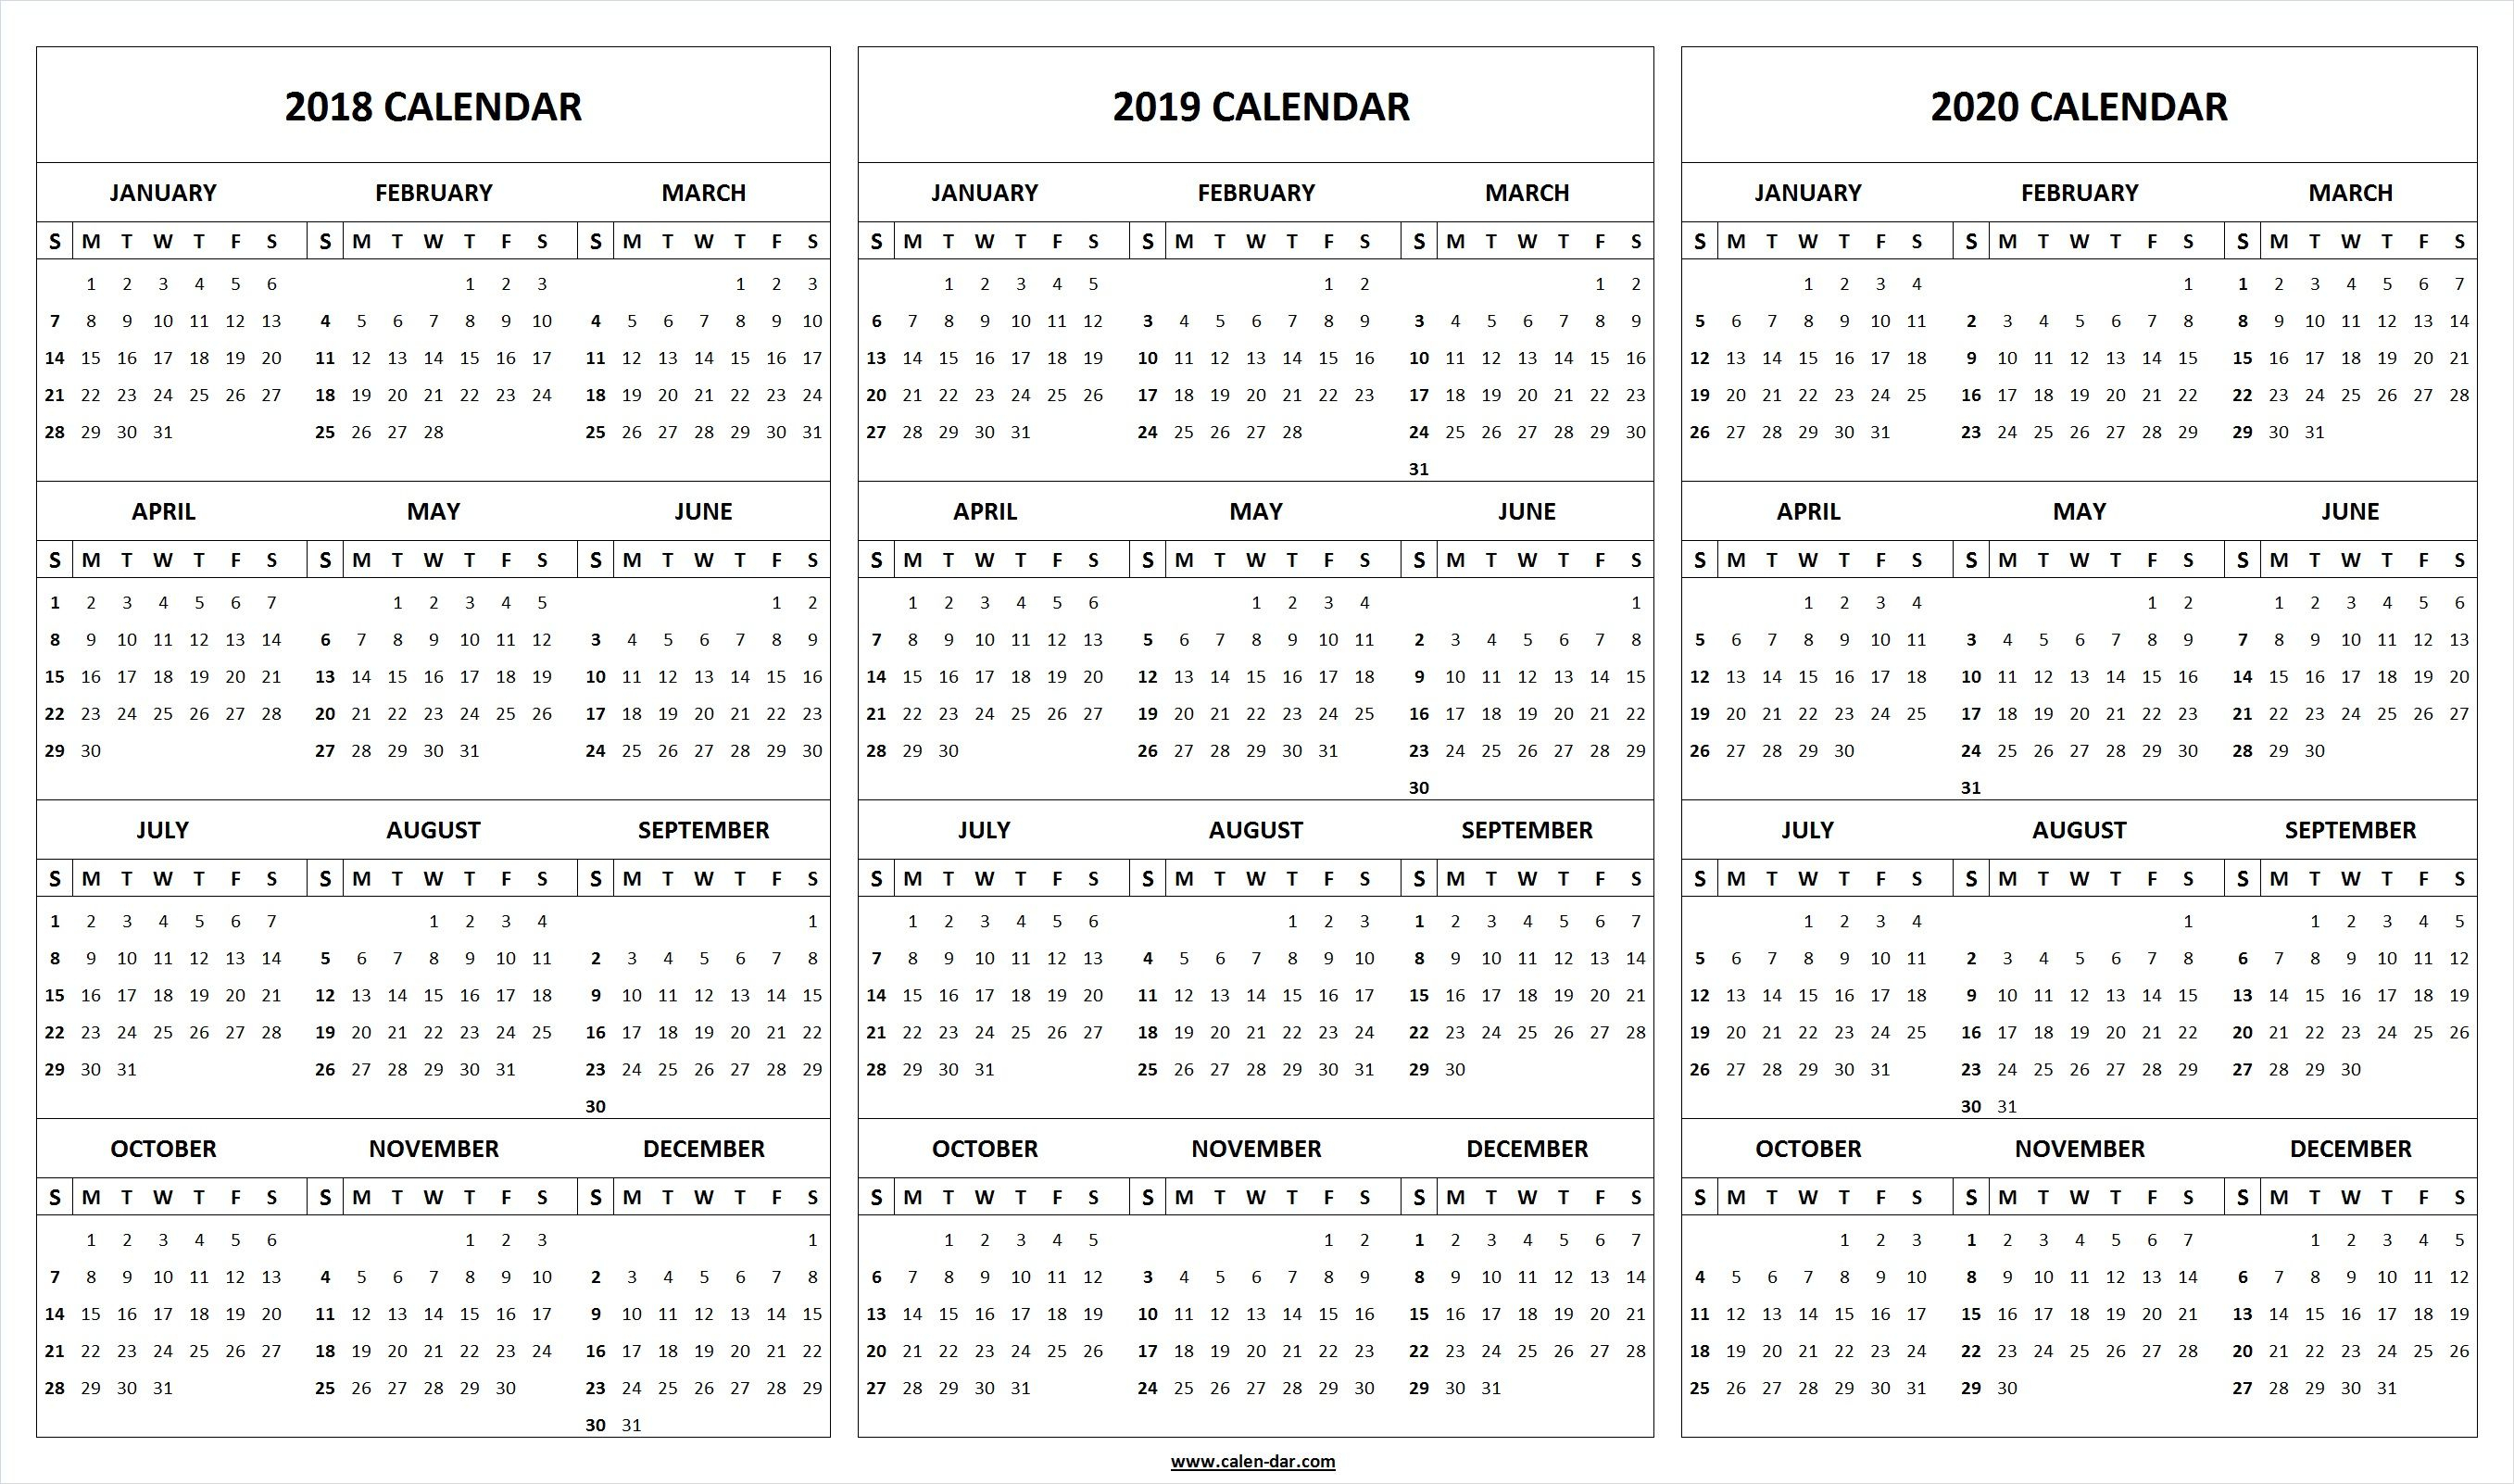 Print Blank 2018 2019 2020 Calendar Template | Organize! | 2019 pertaining to Print 2019 2020 2021 2022 2023 Calender